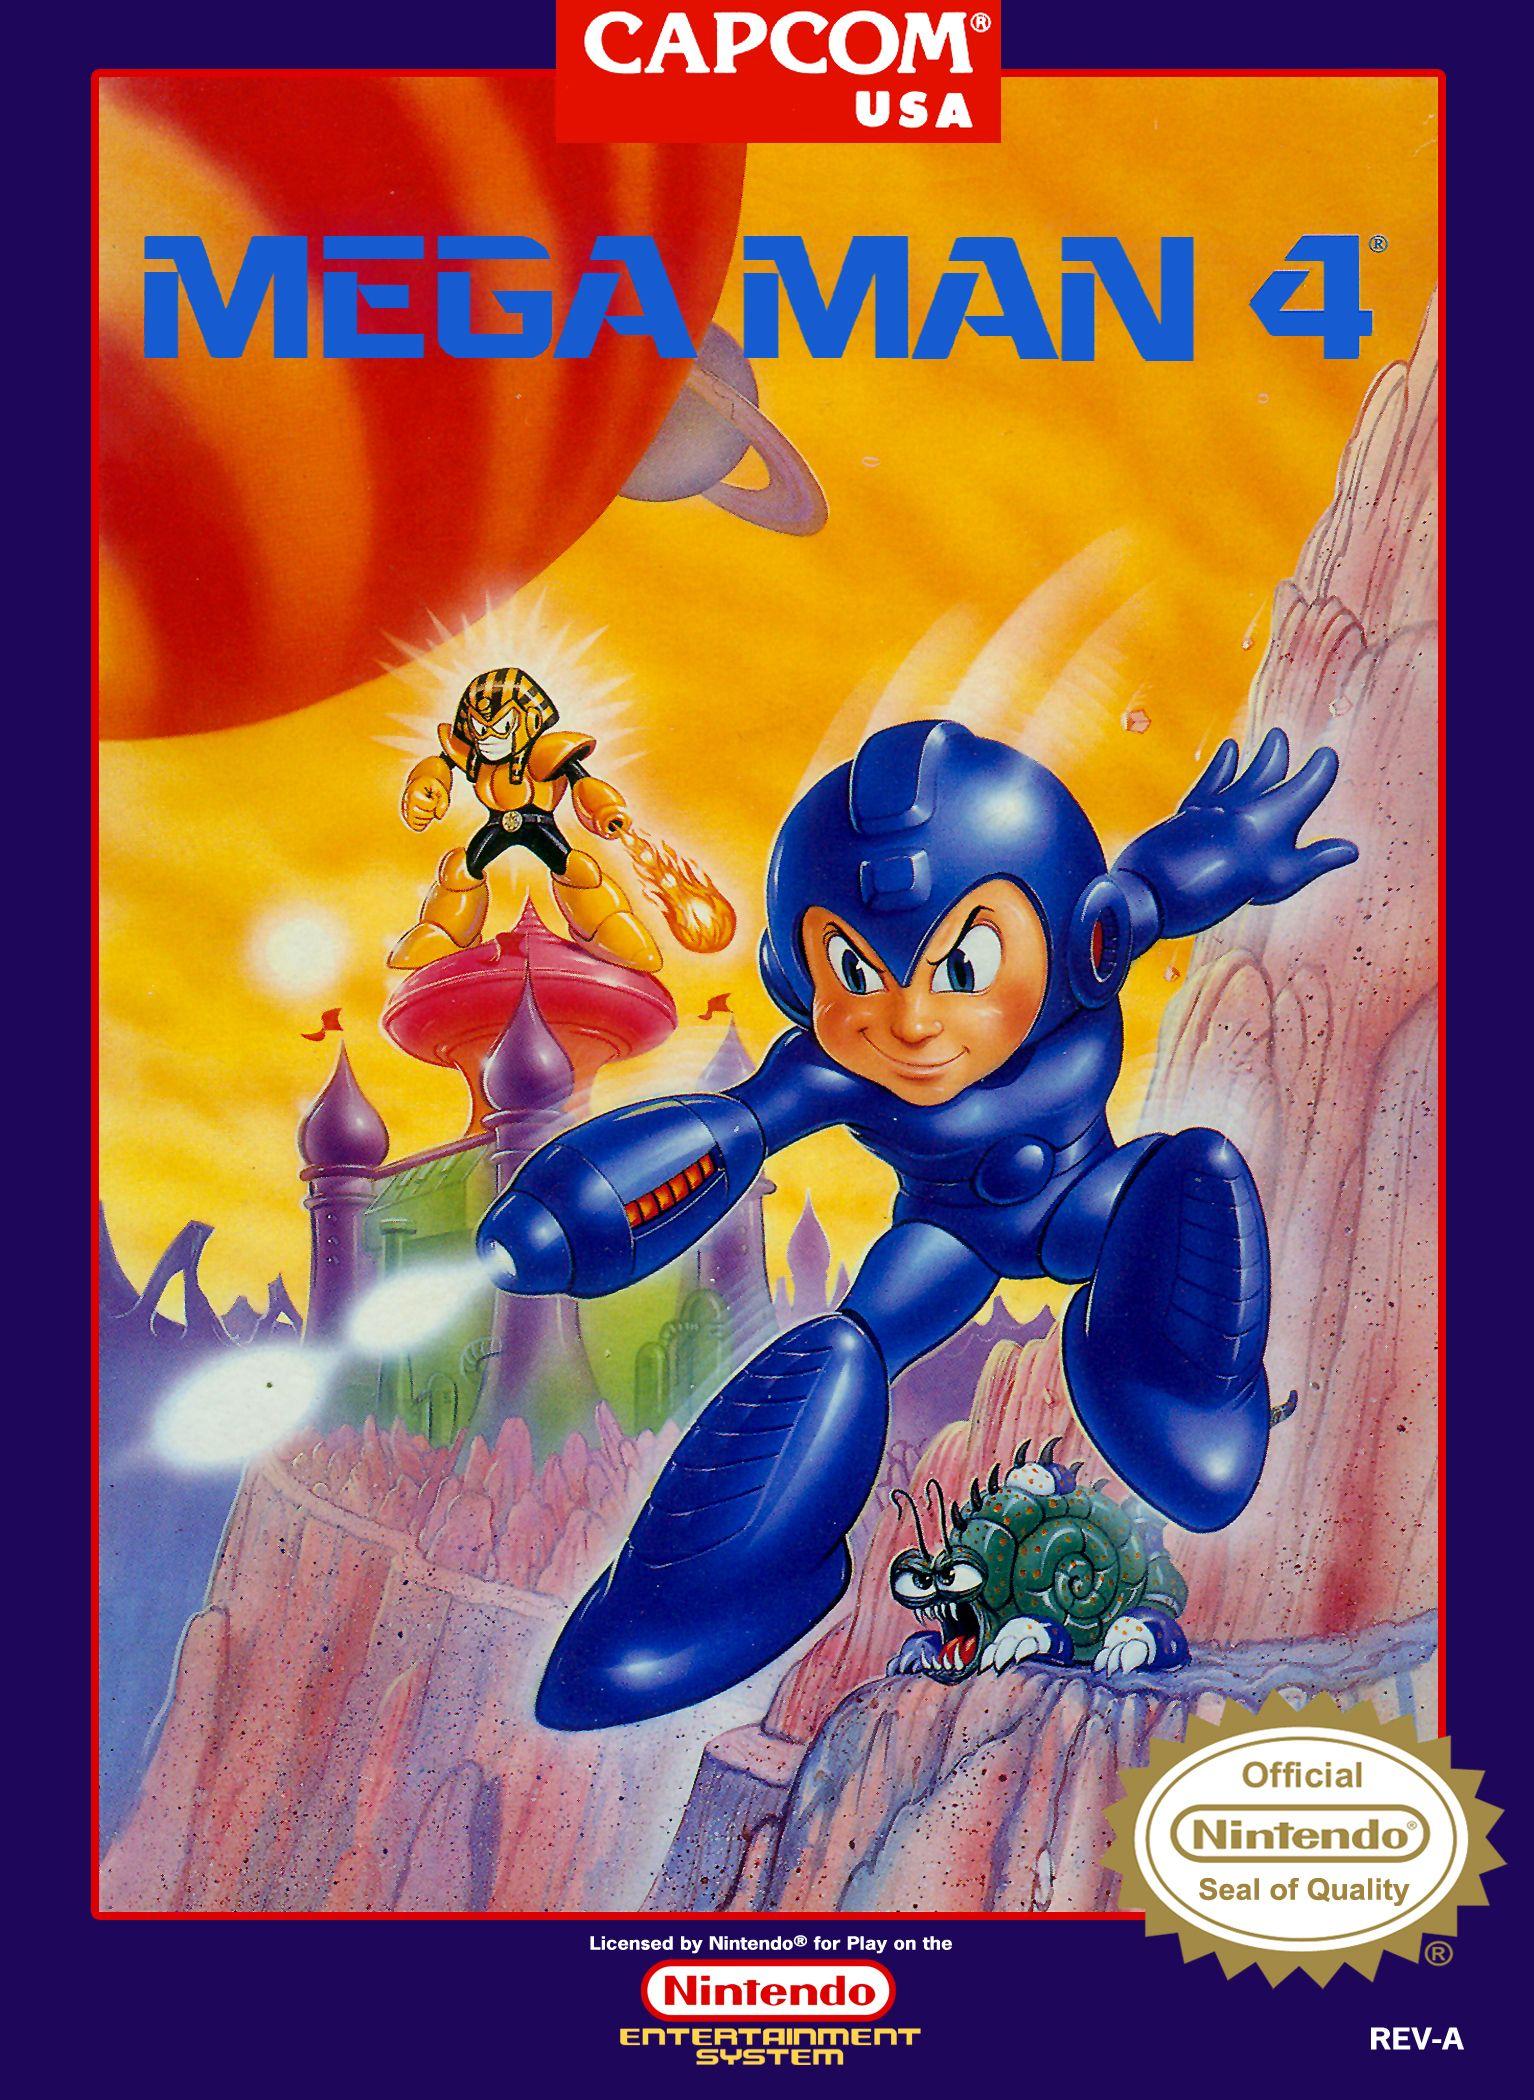 Mega Man 4. 1991. (With images) Mega man, Nes